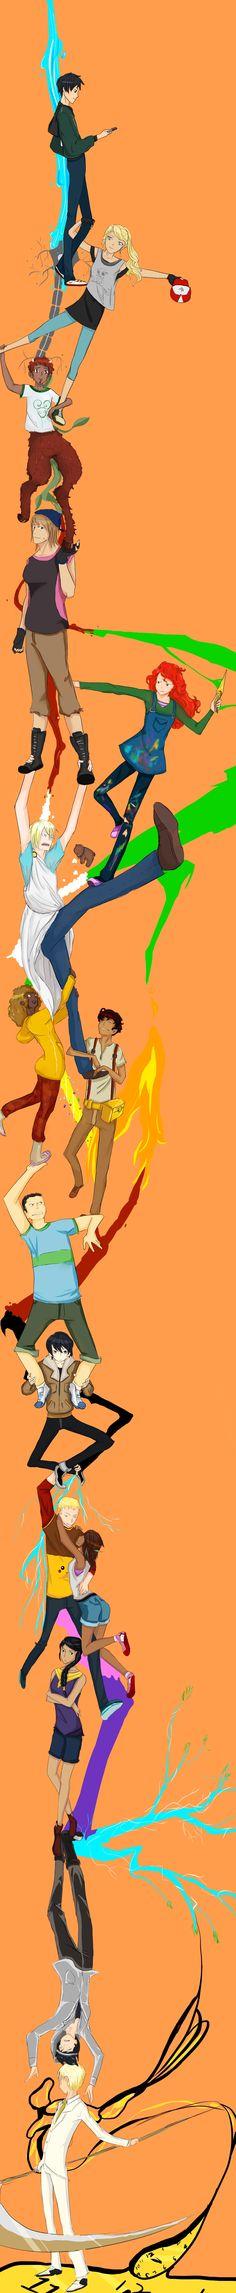 Percy, Annabeth, Grover, Clarisse, Rachel Dare, Octavian, Hazel, Leo, Frank, Nico, Jason, Piper, Reina, Thalia & Luke